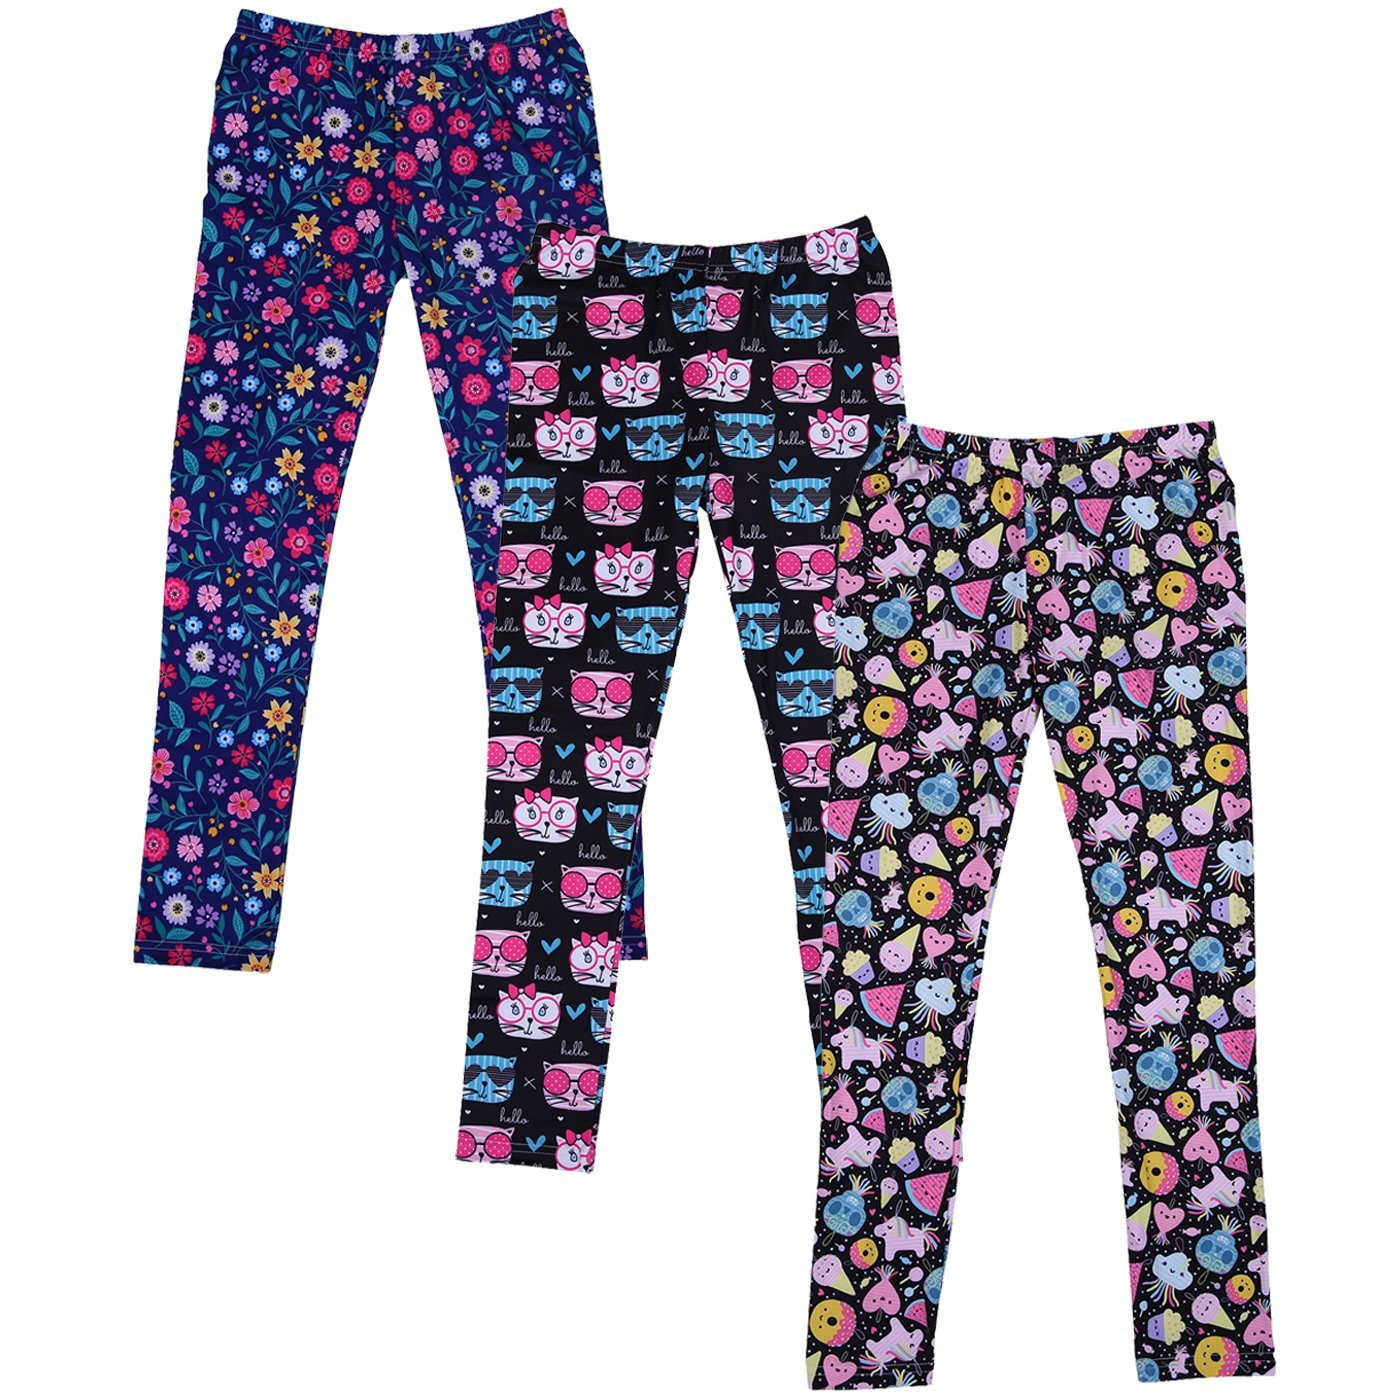 HDE Girl's Leggings 3 Pack With Print Designs Full Ankle Length Kids Pants 3-11Y